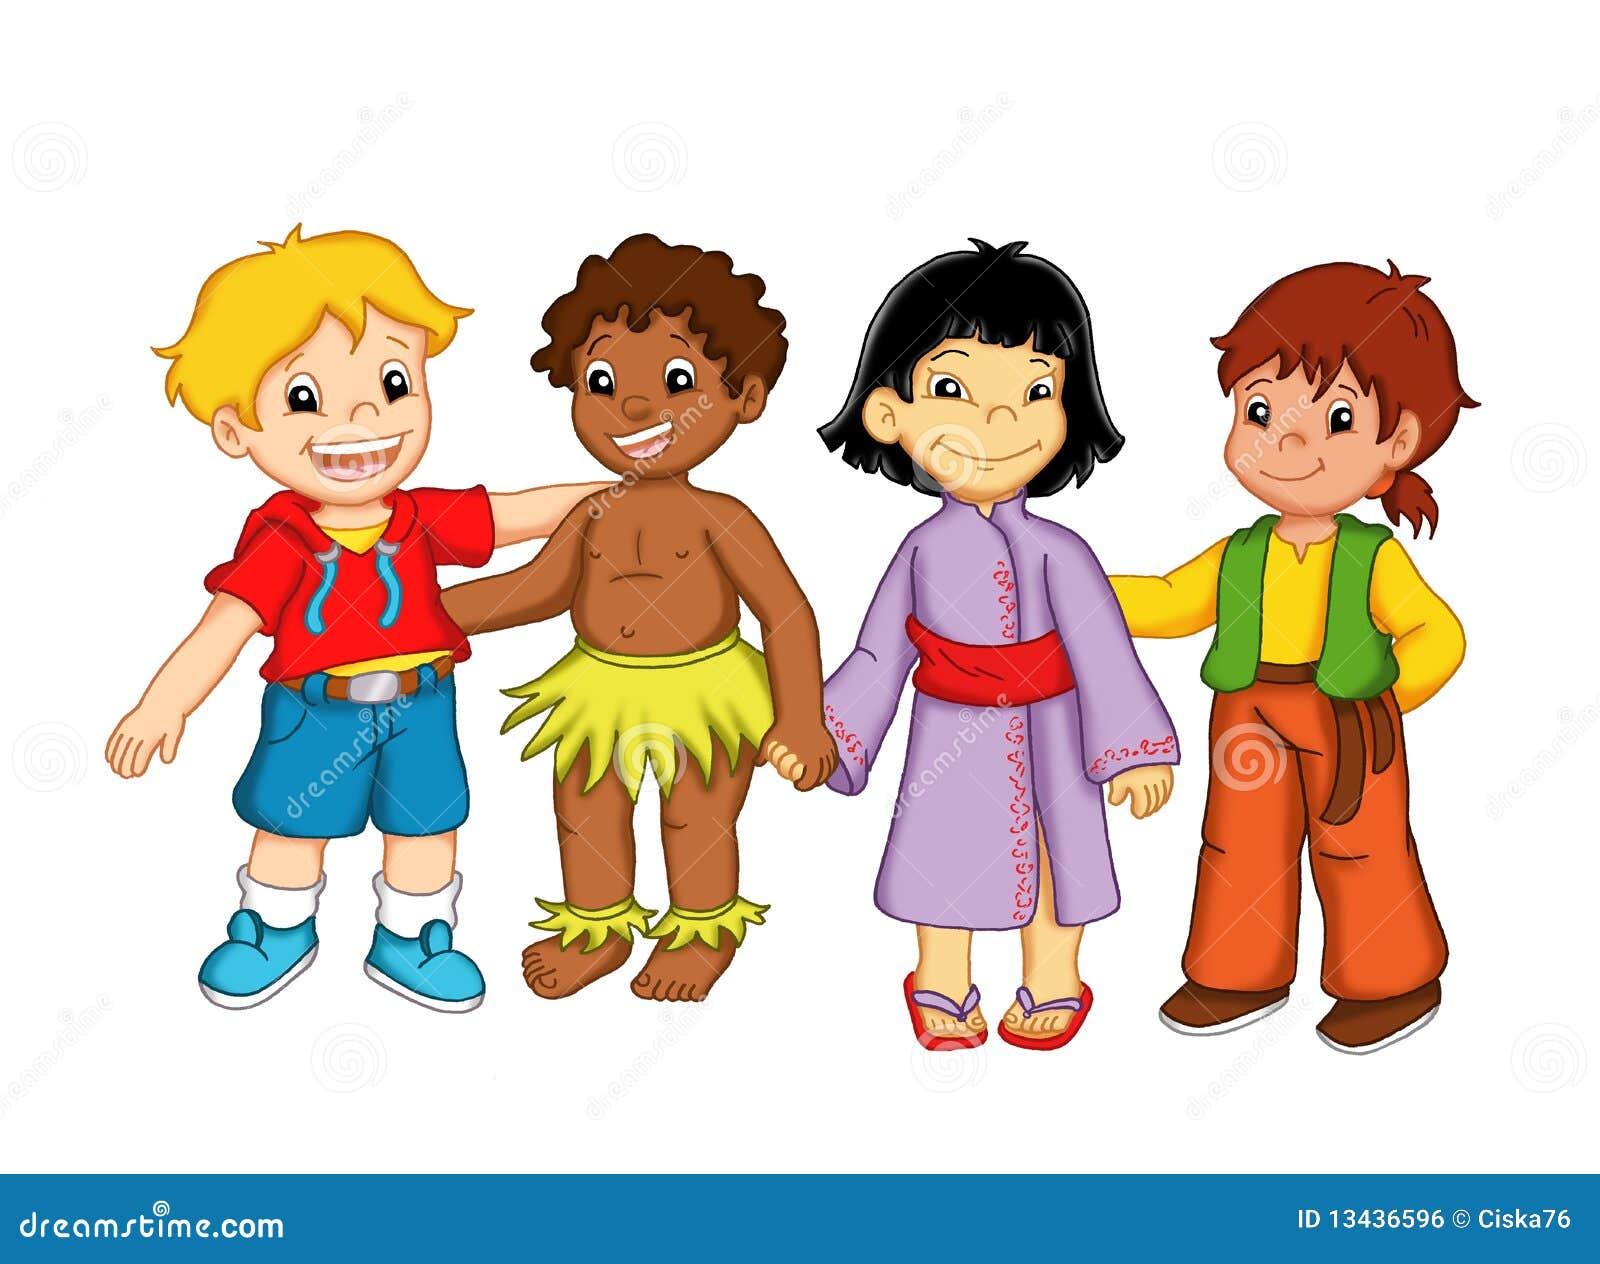 Essay: A Multicultural Nationalism?